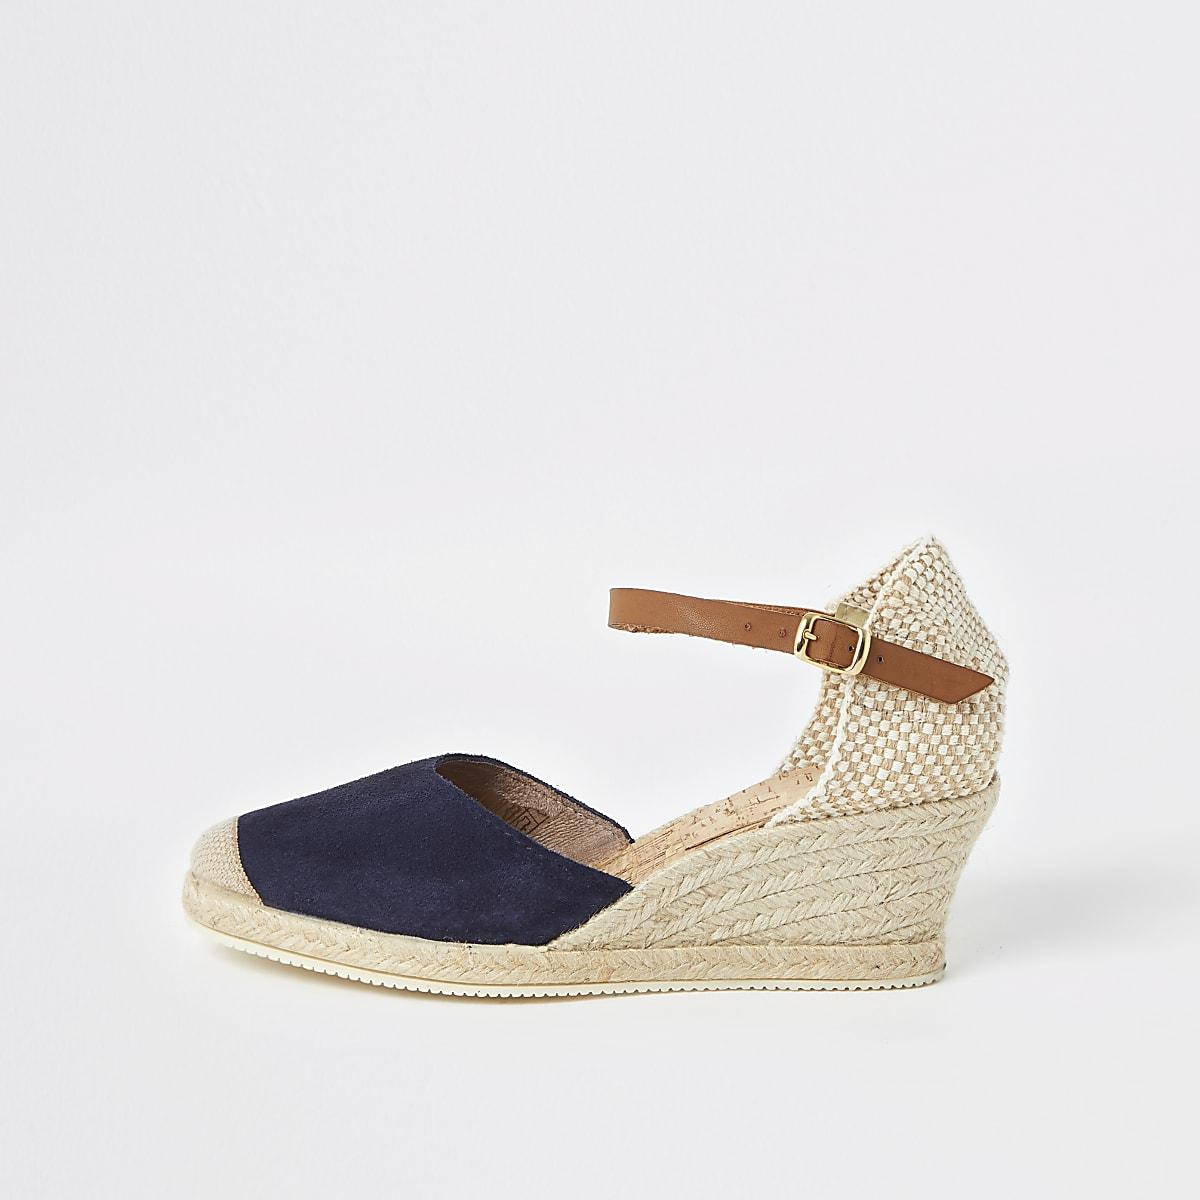 Ravel navy espadrille wedge sandals